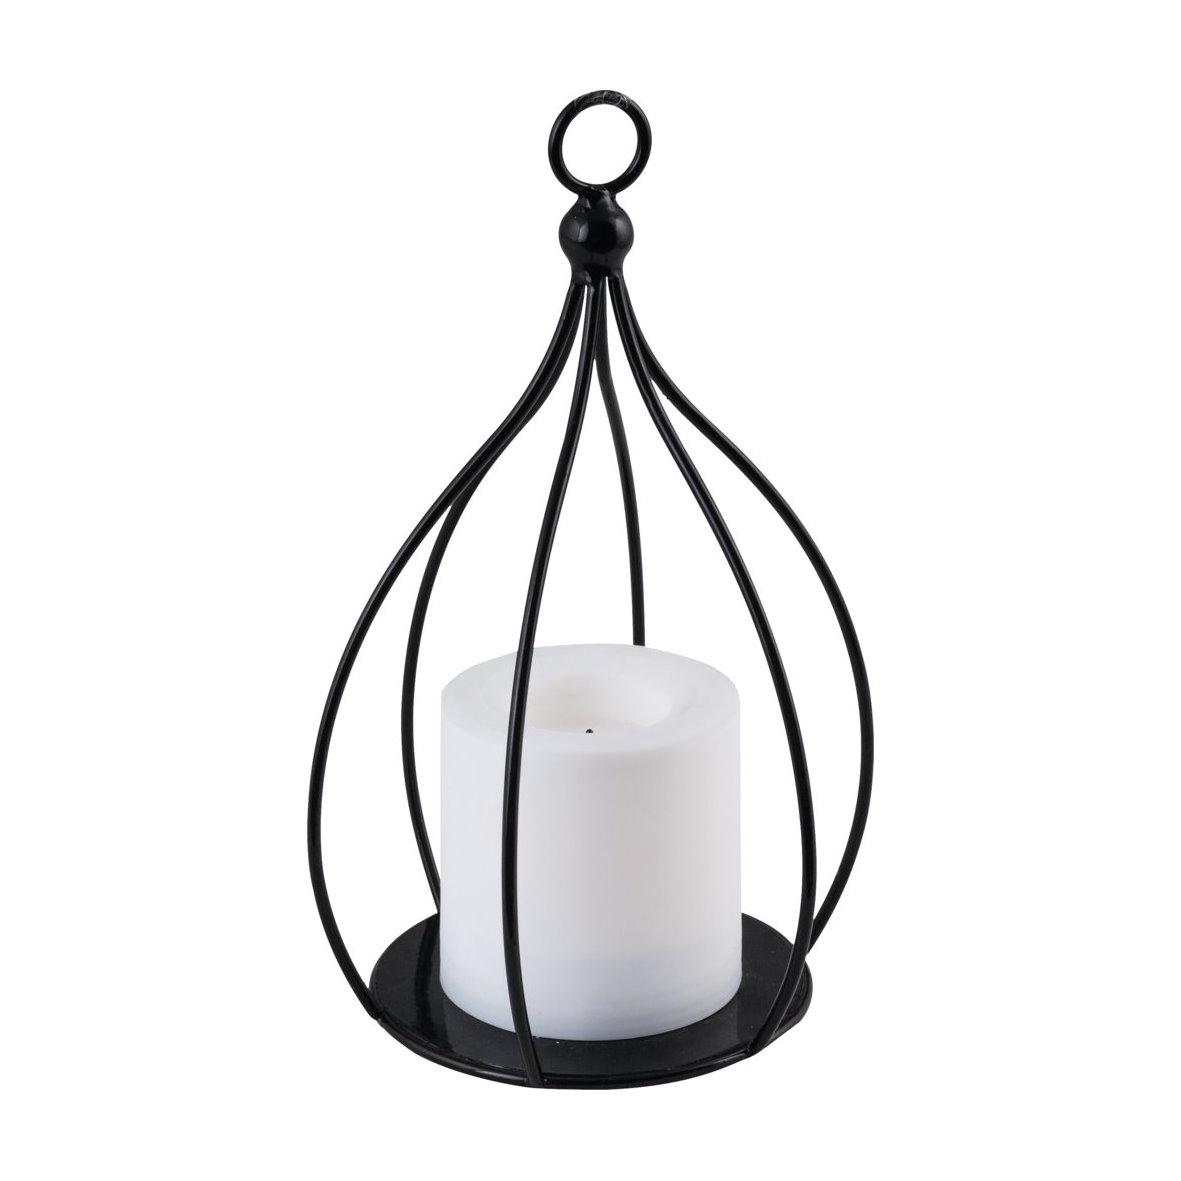 led laterne leuchte haus deko vintage lampe batterie flackerlicht licht ambiente. Black Bedroom Furniture Sets. Home Design Ideas